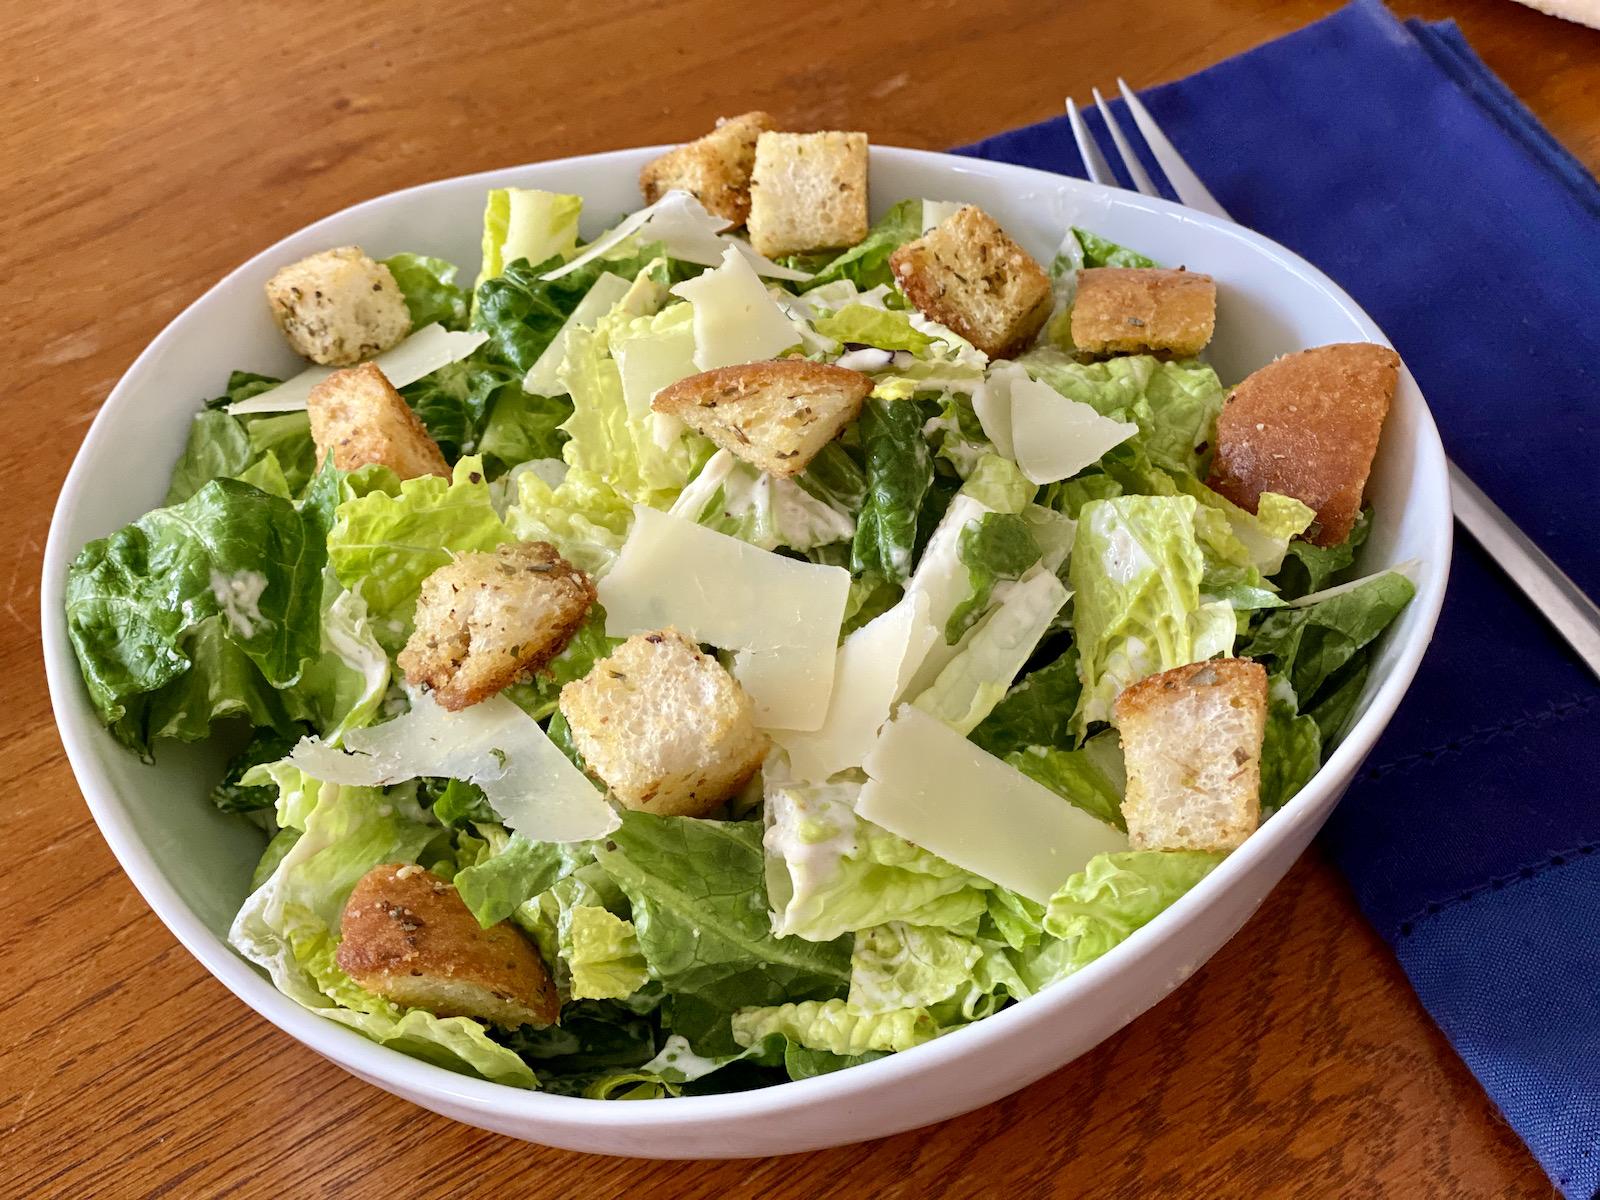 Transfer Pizzeria's Caesar salad